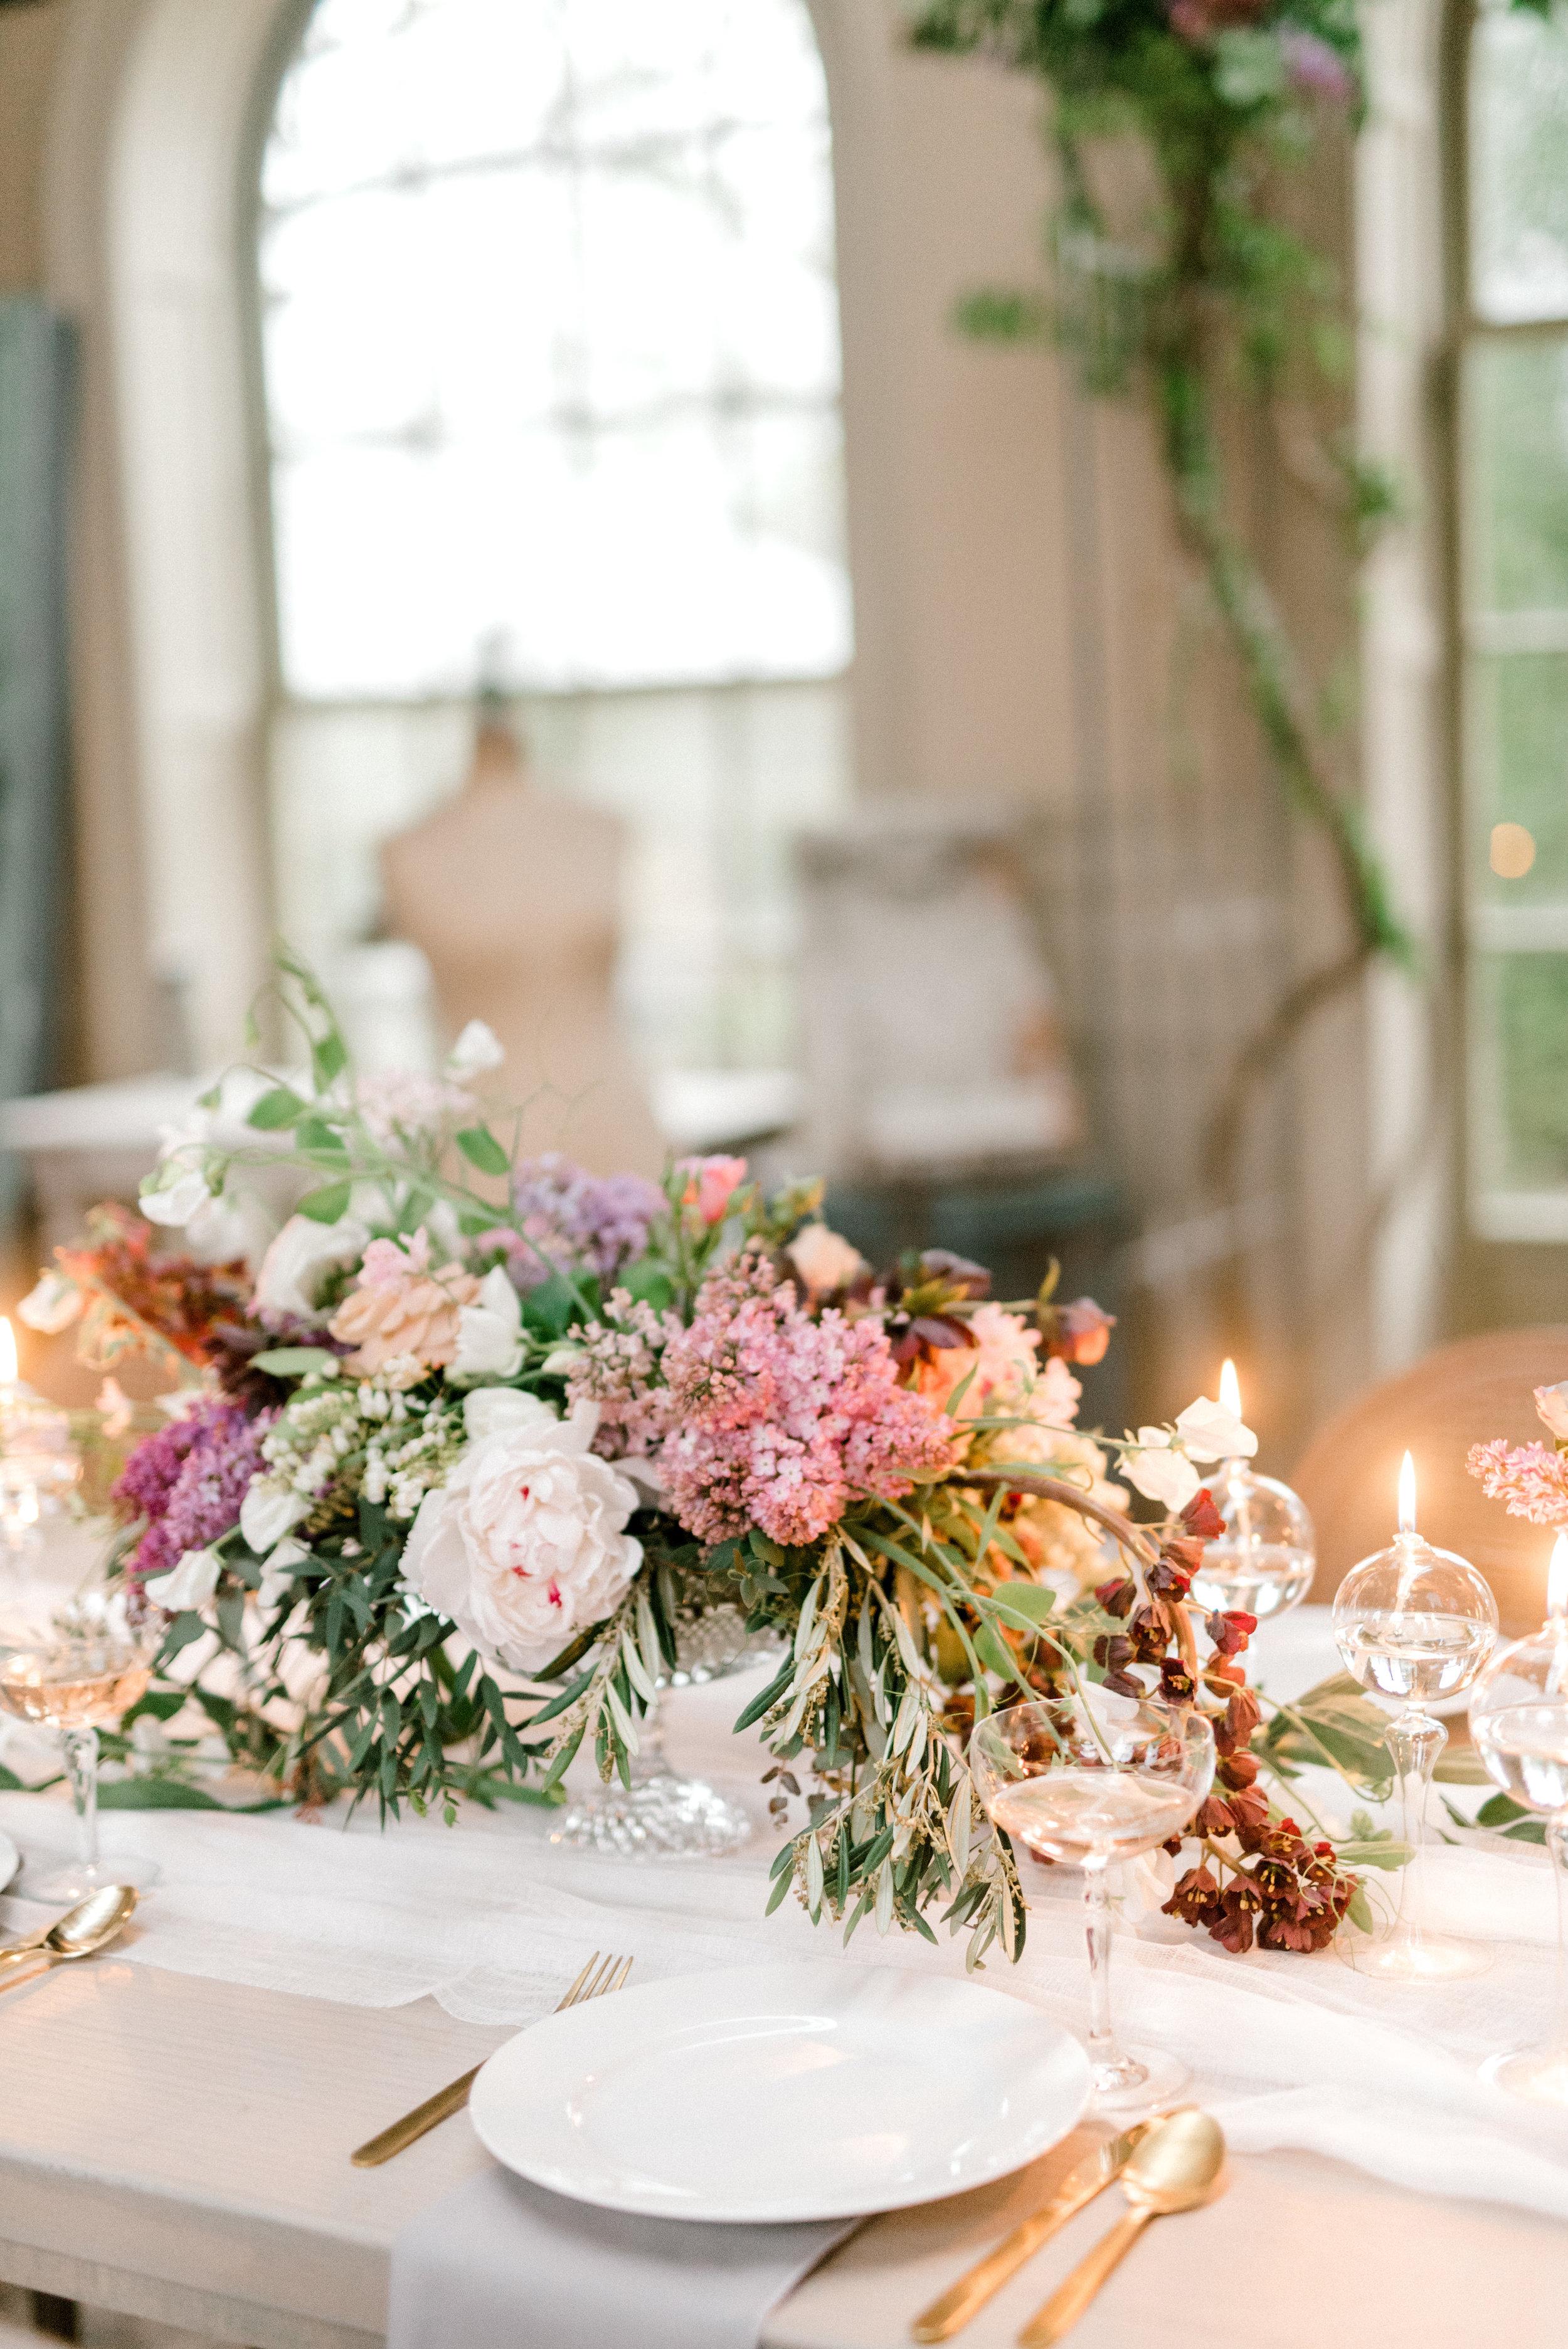 haley-richter-photography-jardin-de-buis-wedding-photos-greenhouse-wedding-bhldn-gown-lilac-wedding-bouquet-beaded-wedding-gown-new-jersey-weddings-garden-wedding-lilac-centerpeice